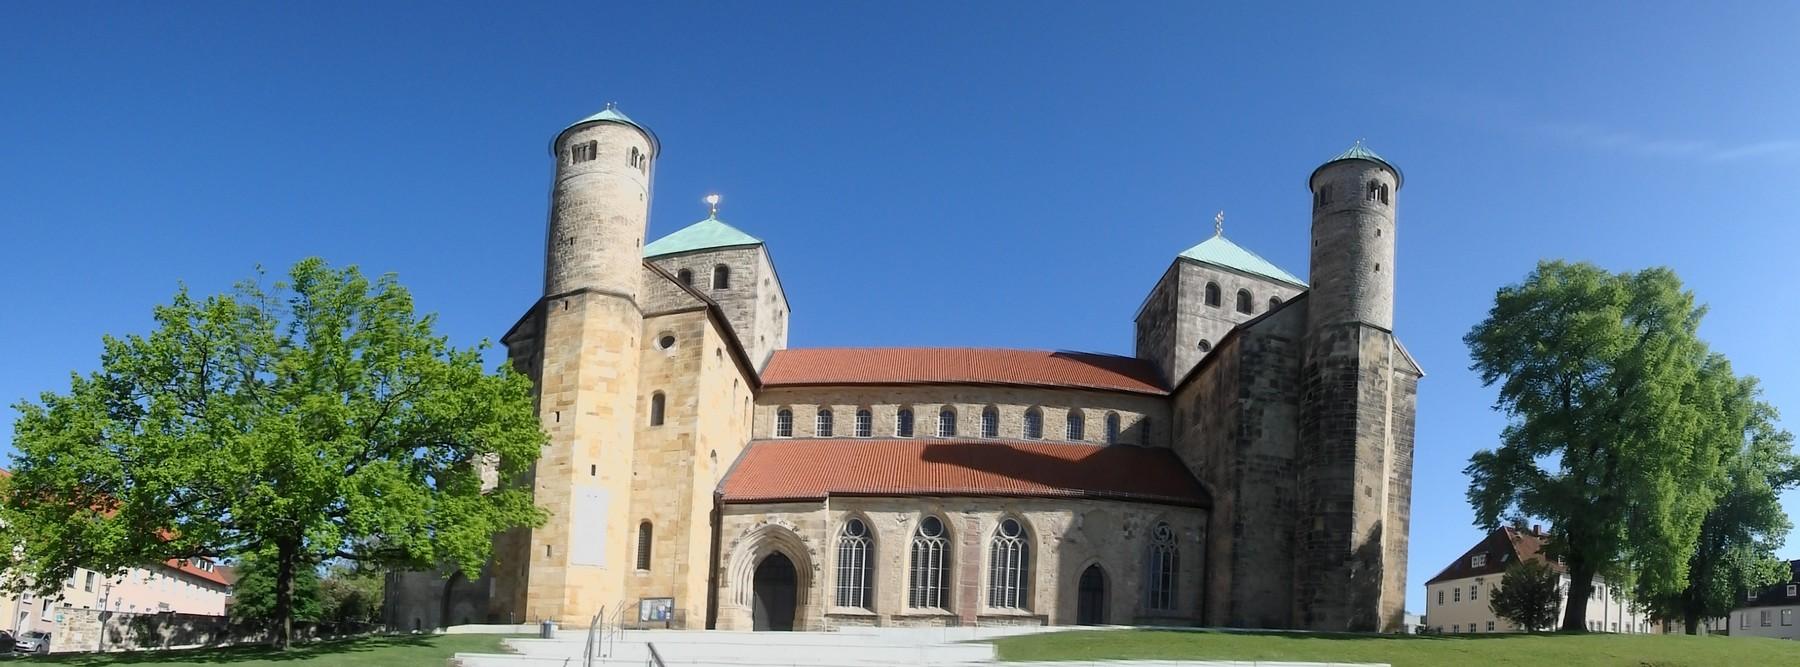 P5030001 Pano Hildesheim iglesia de San Miguel Unesco Alemania